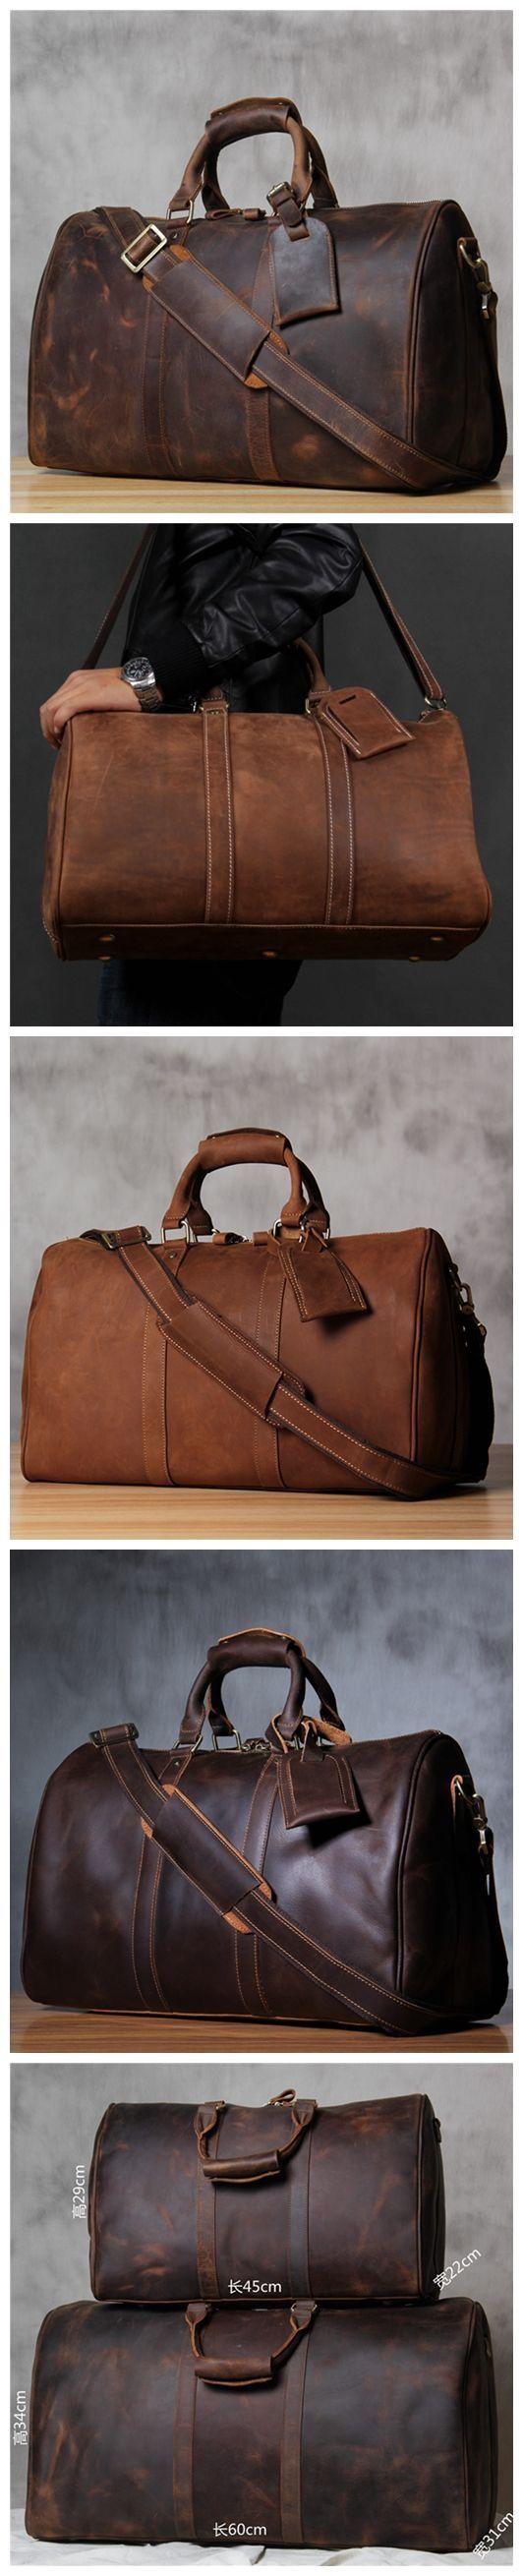 Handmade Extra Large Vintage Full Grain Leather Travel Bag, Duffle Bag, Holdall…